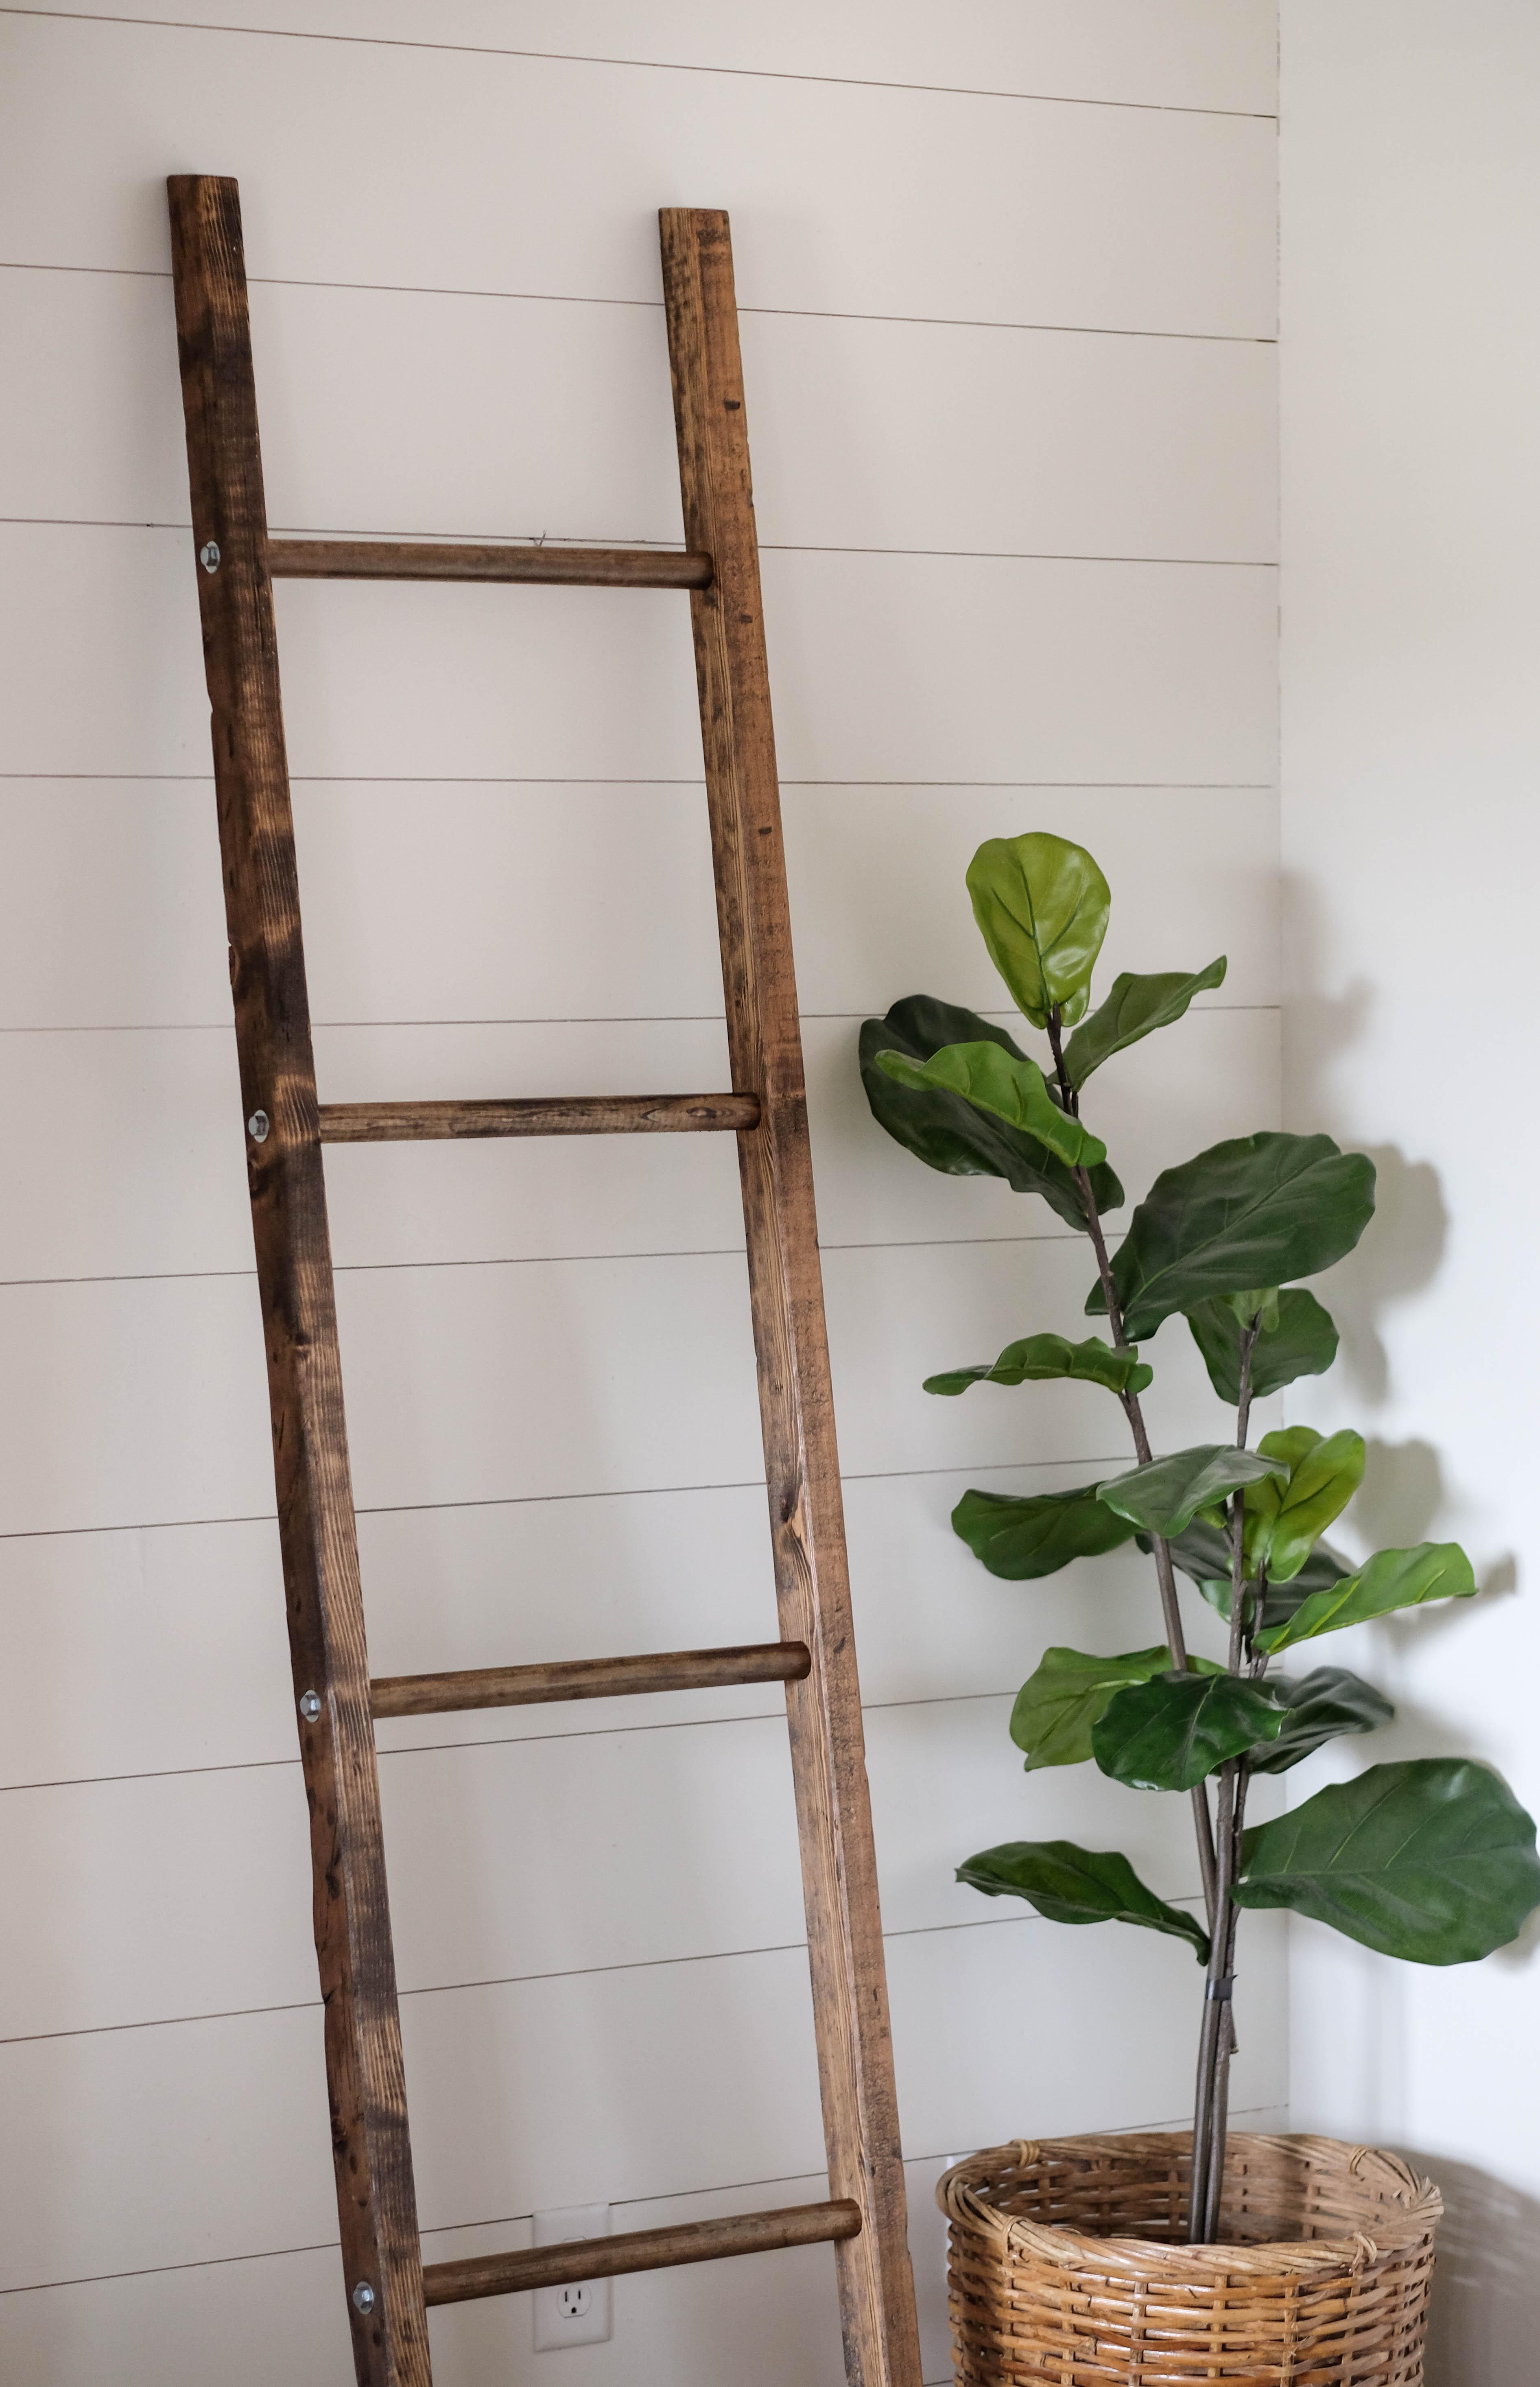 Easy Diy Blanket Ladder Plans Easy Step By Step Guide Under 15